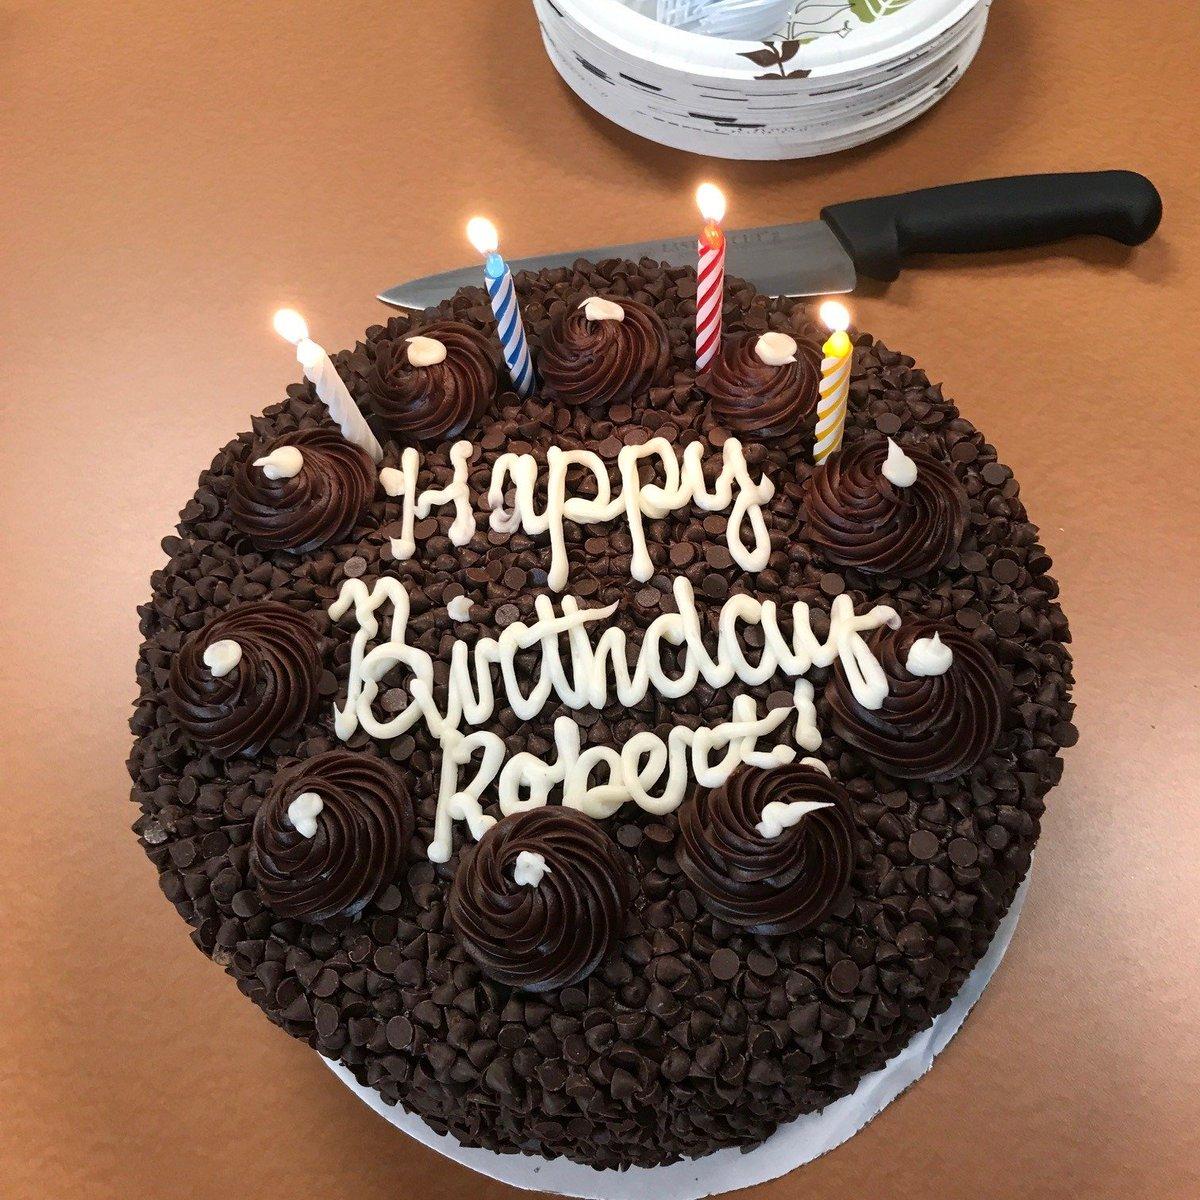 Semper Home Loans Inc บนทว ตเตอร Happy Birthday To Robert Quinn Semper S Director Of Capital Markets Our Team Had No Problem Devouring The Entire Cake From Gregg S Restaurant Localbusiness Ri Greggsrestaurant Semper Https T Co Bqwk8uxqga